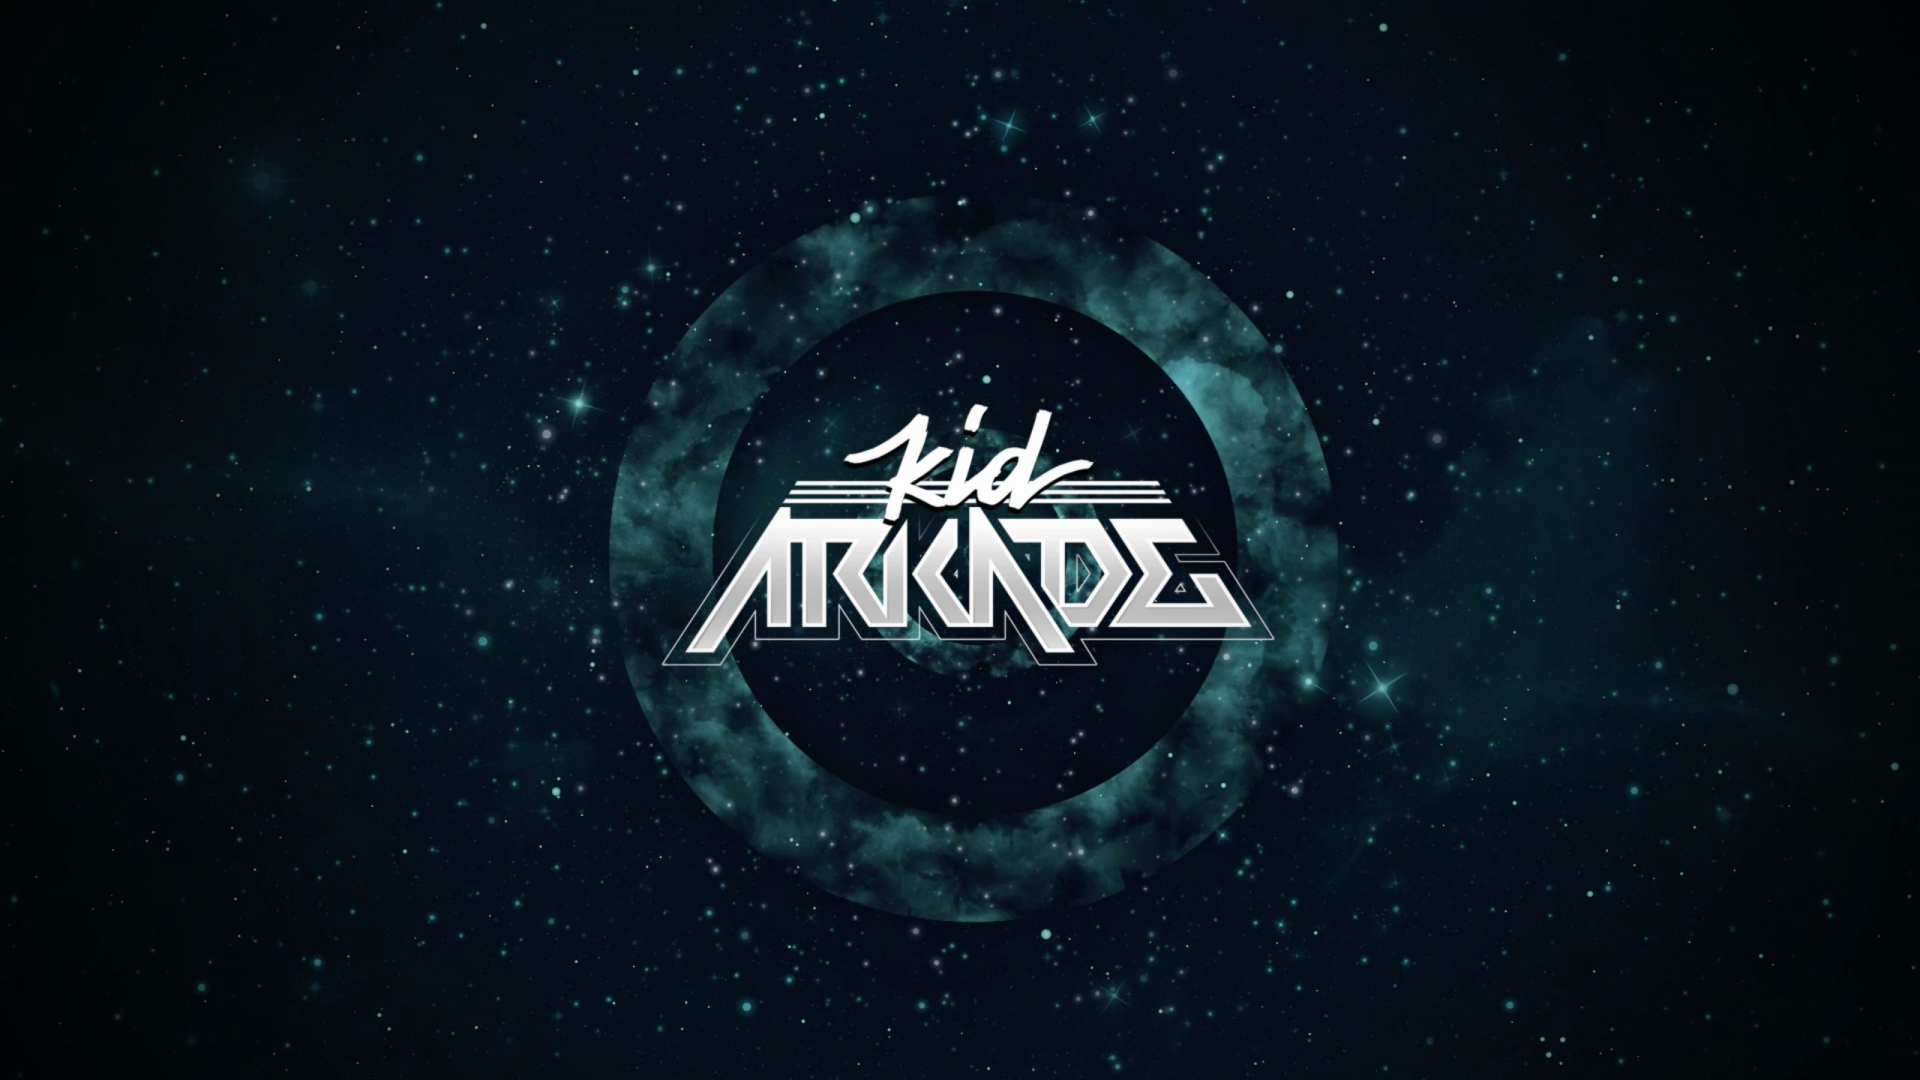 kid arkade logo